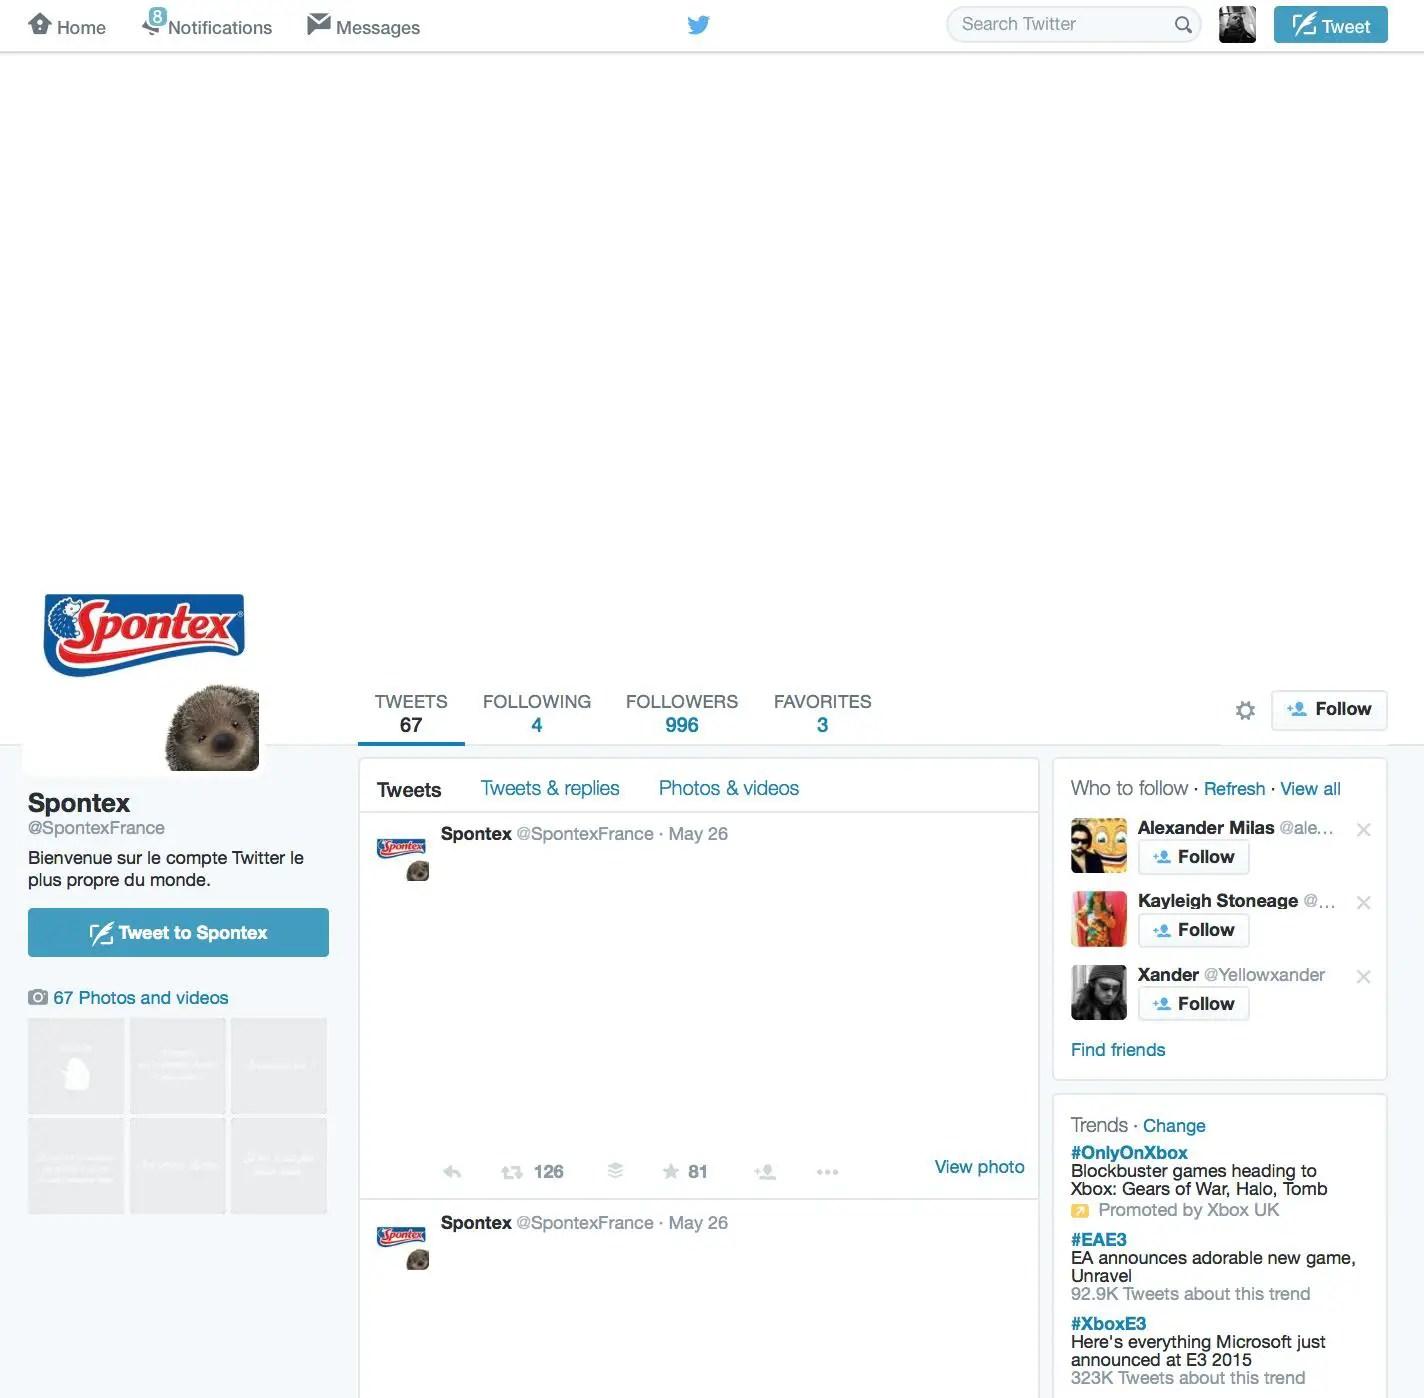 wersm-spontex-france-cleanest-twitter-account